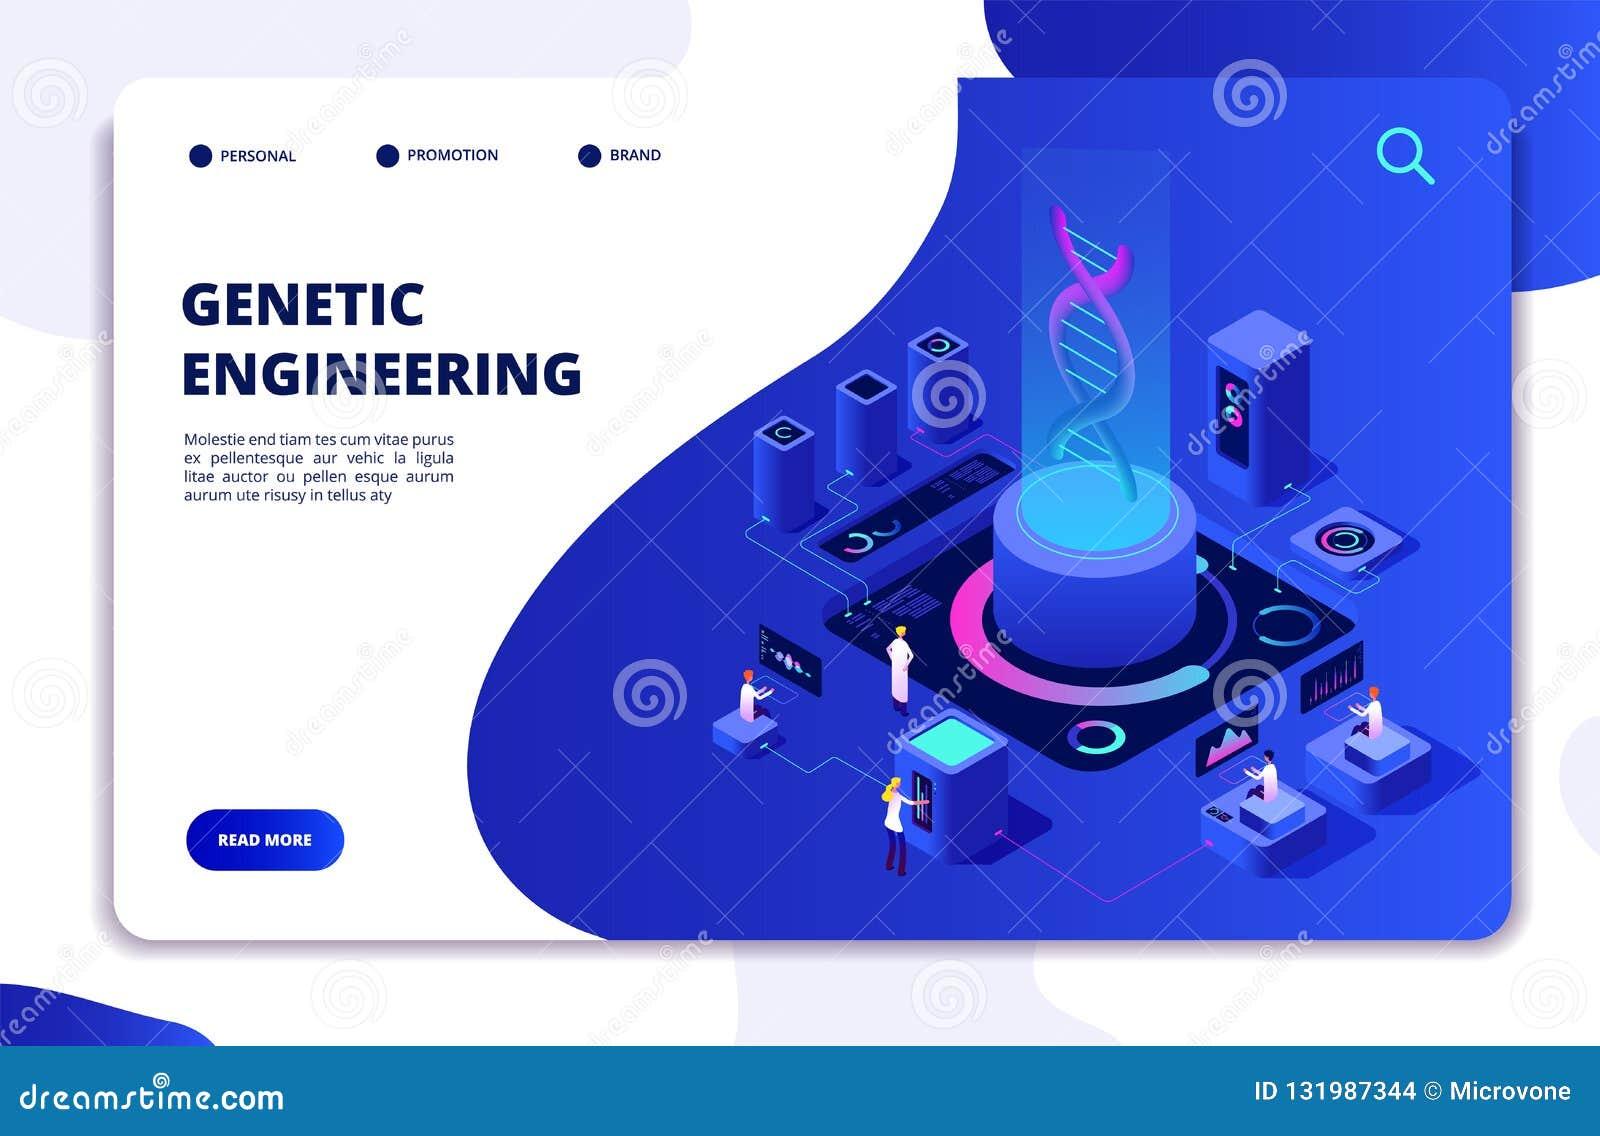 Isometric έννοια DNA Εργαστήριο γενετικής εφαρμοσμένης μηχανικής με τους επιστήμονες ανθρώπων Γιατροί που ερευνούν τα κύτταρα Θερ